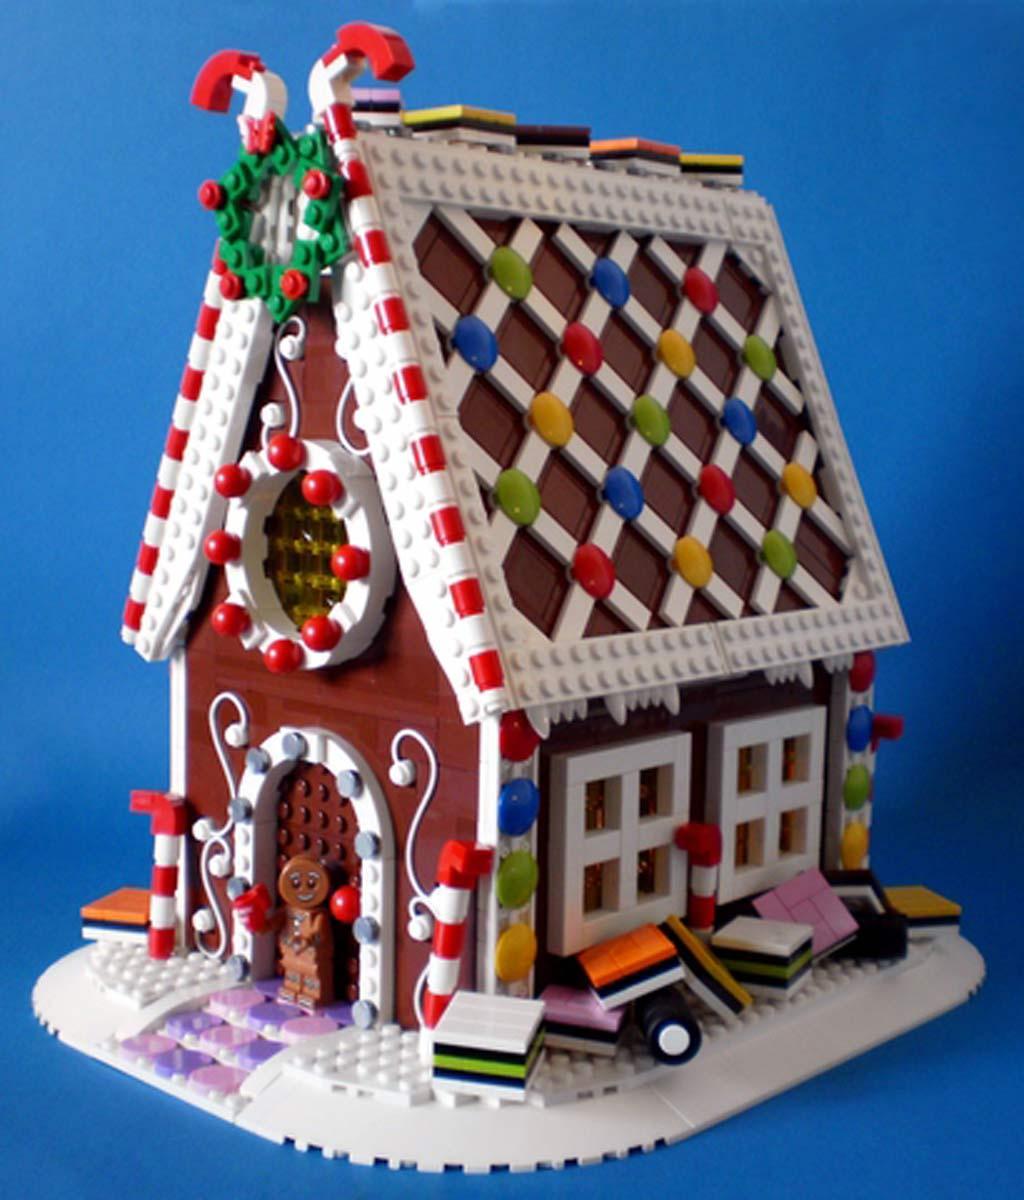 Gingerbread House | @ SwanDutchman / Lego Ideas